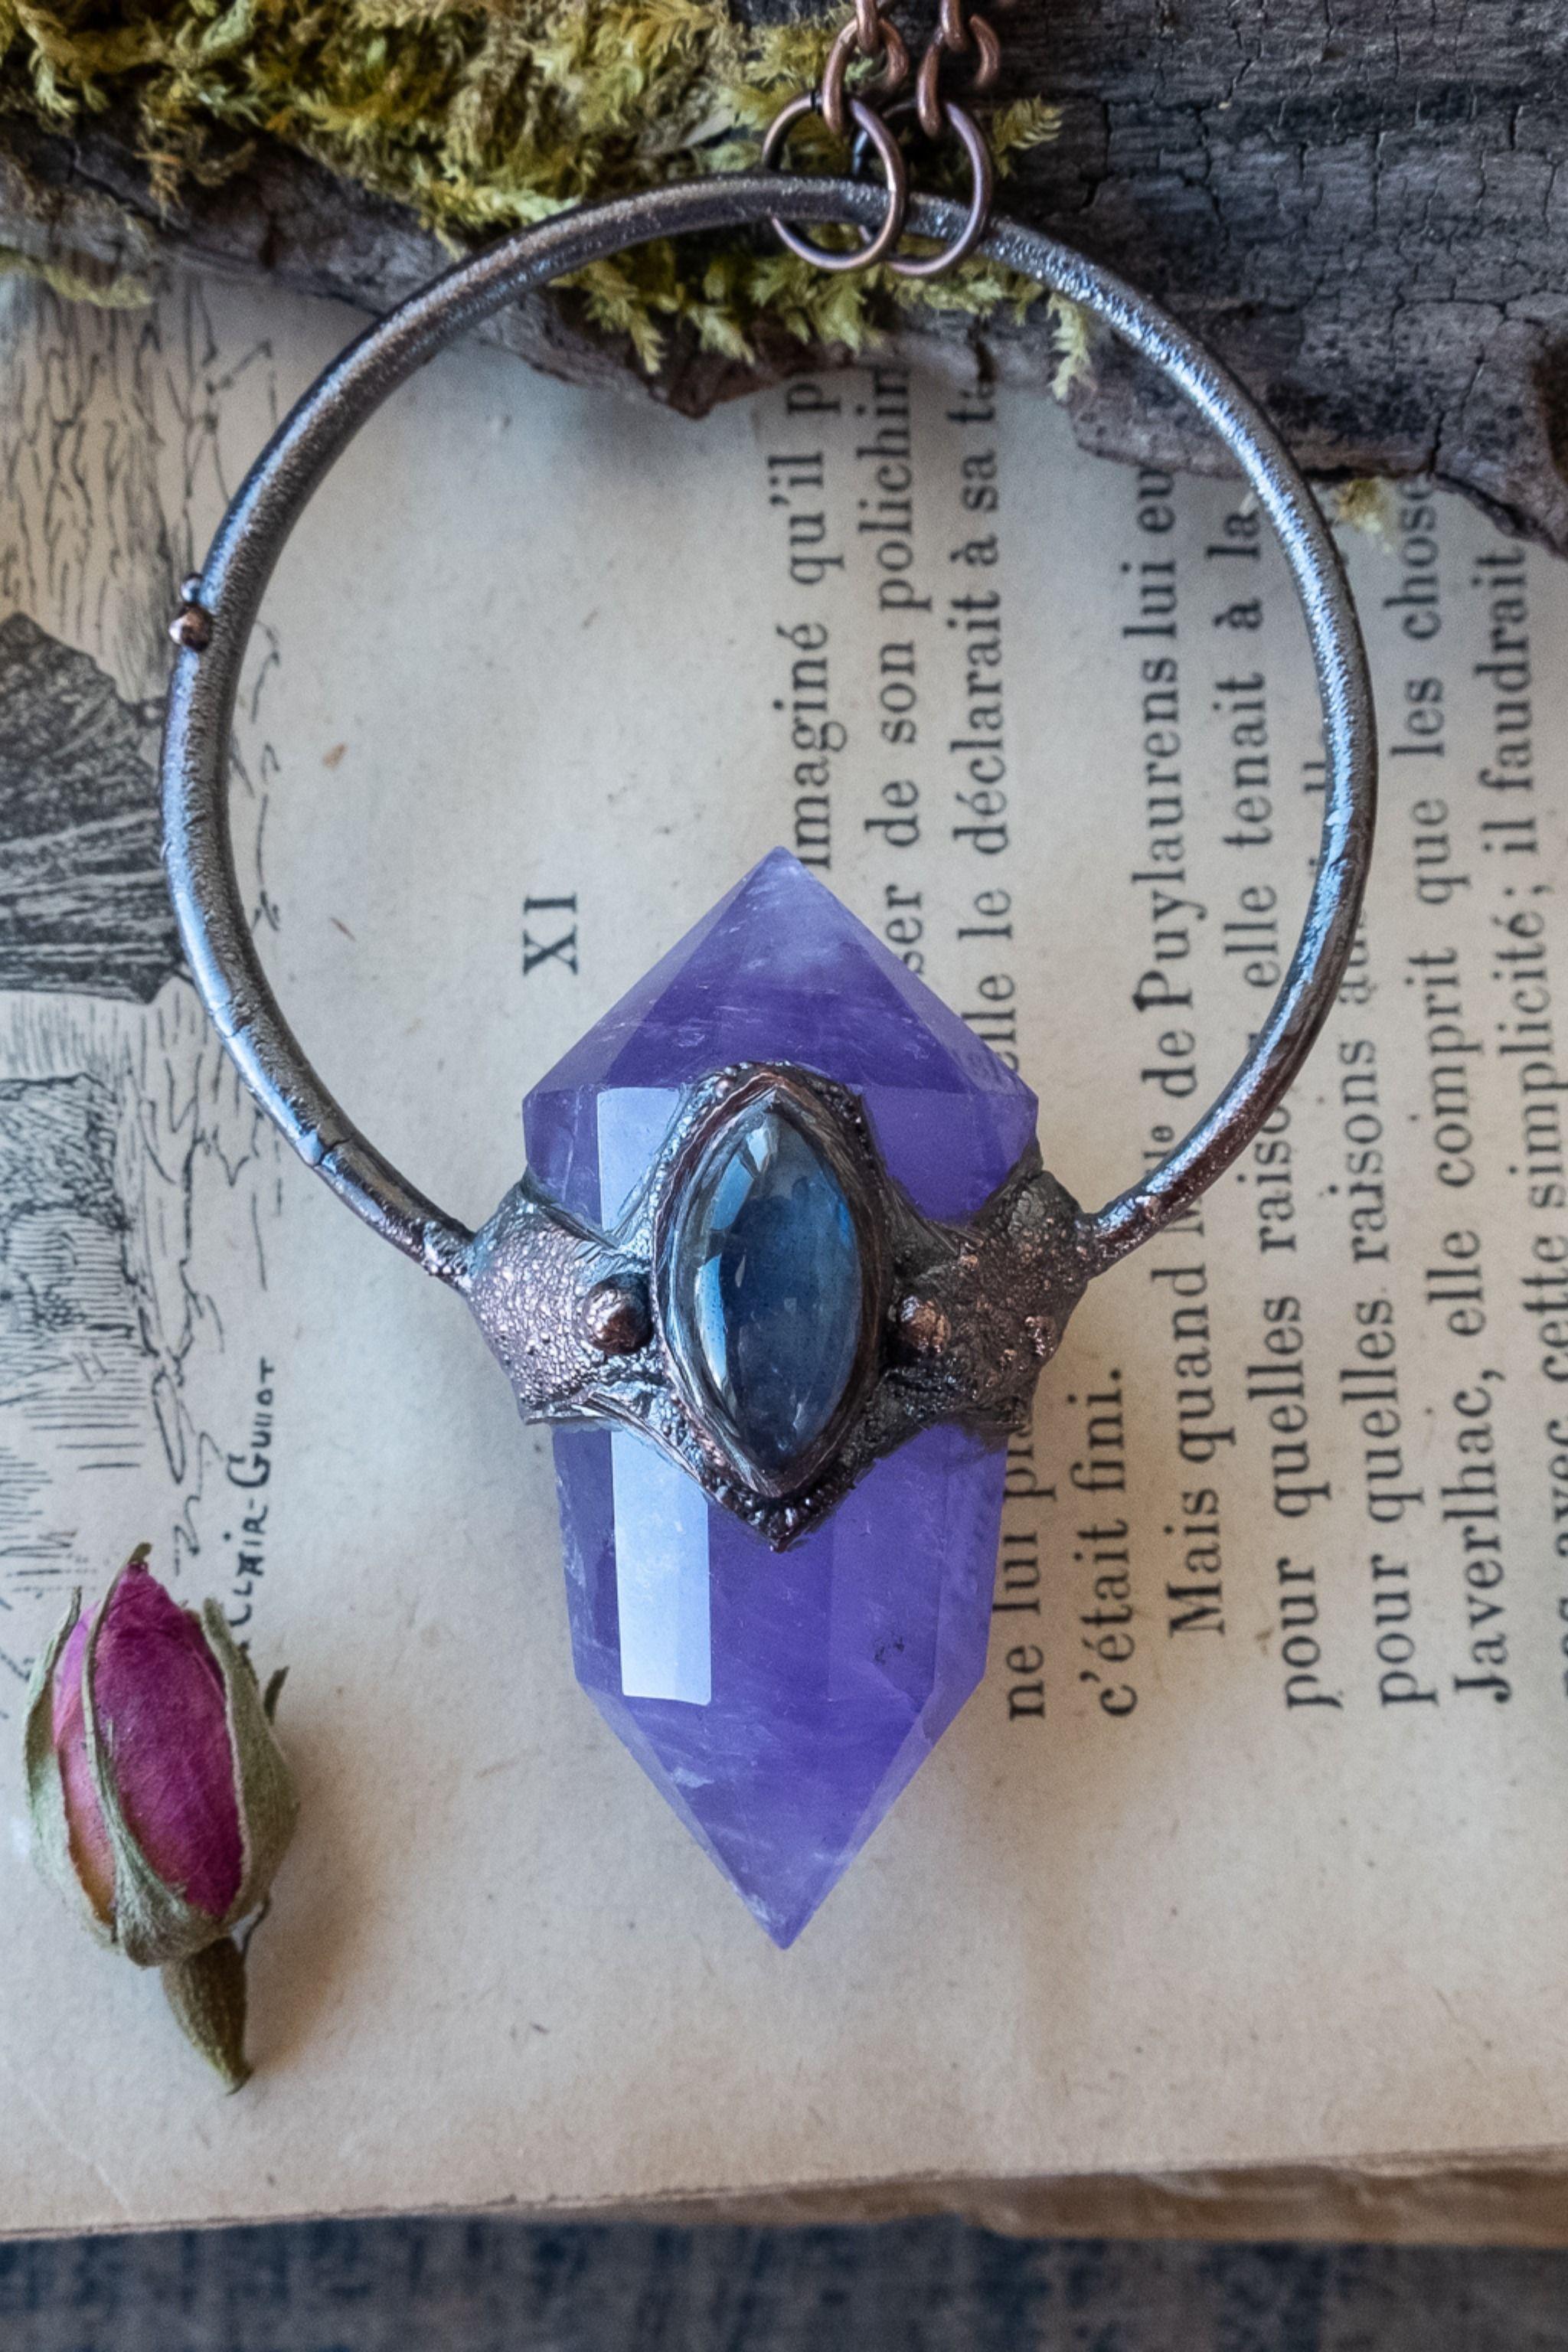 labradorite jewelery crystal necklace Rare purple Labradorite /& Moonstone necklace with solder stud embellishment crystal jewellery